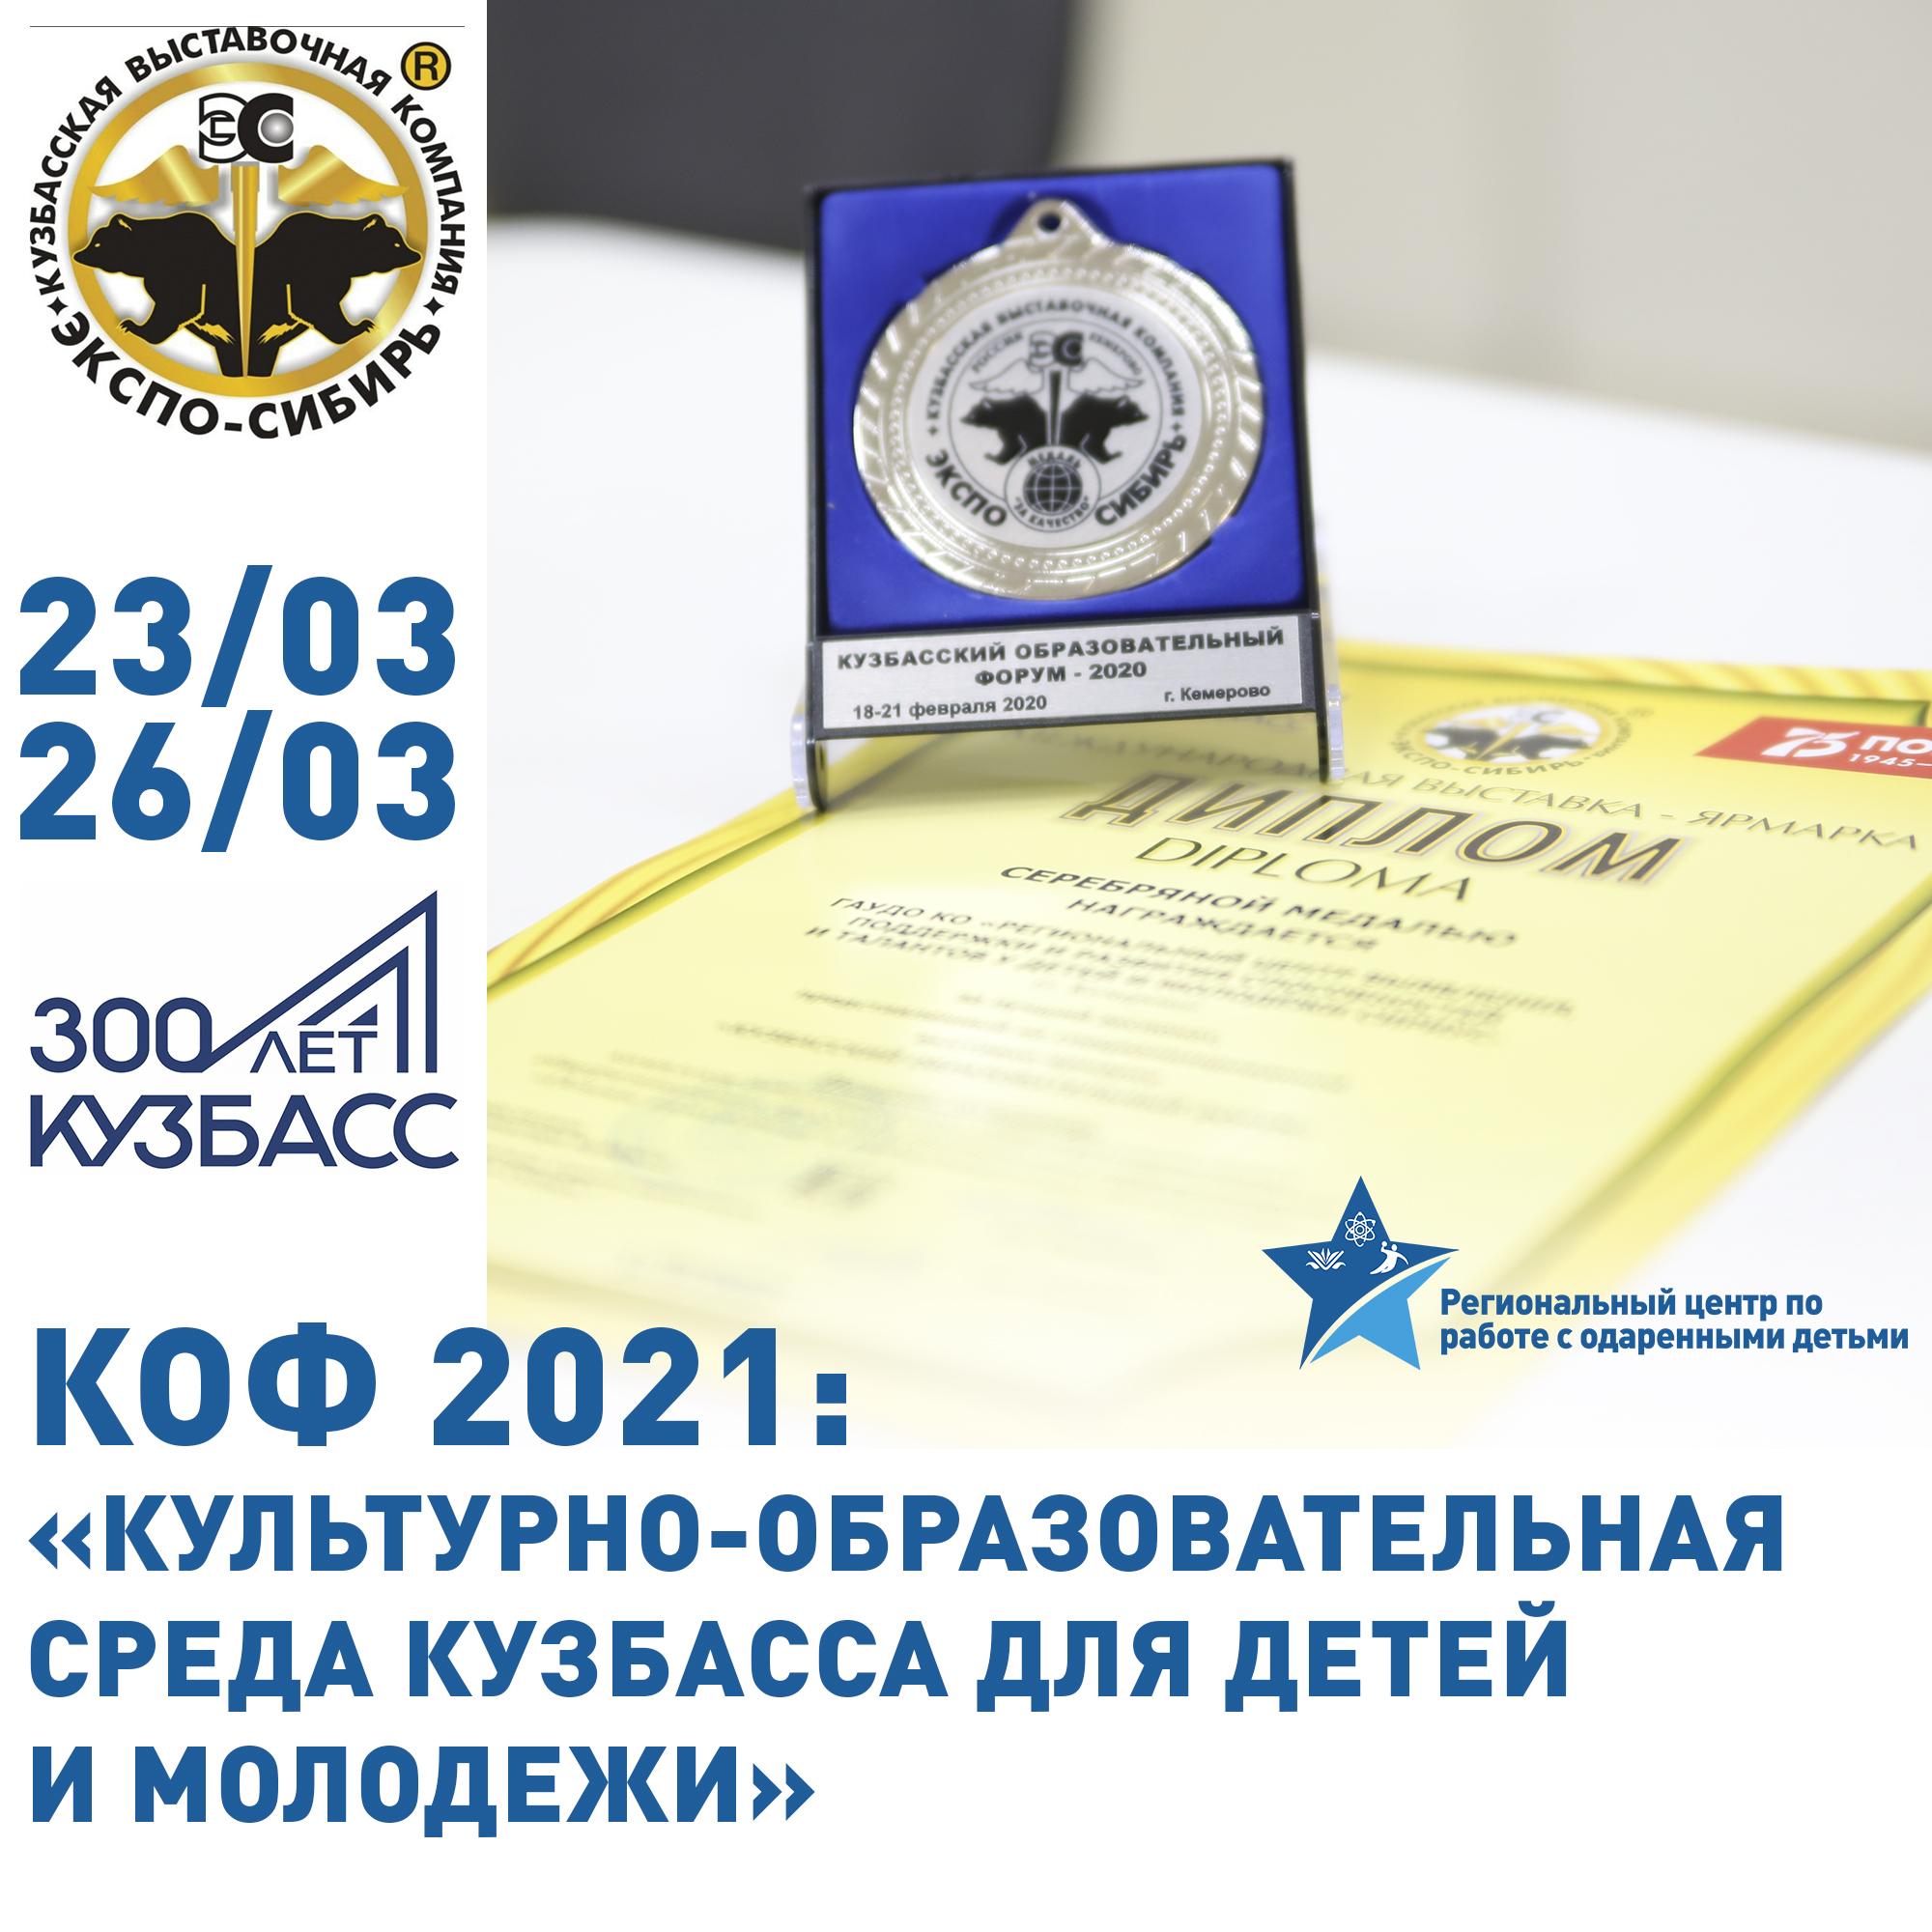 КОф 2021